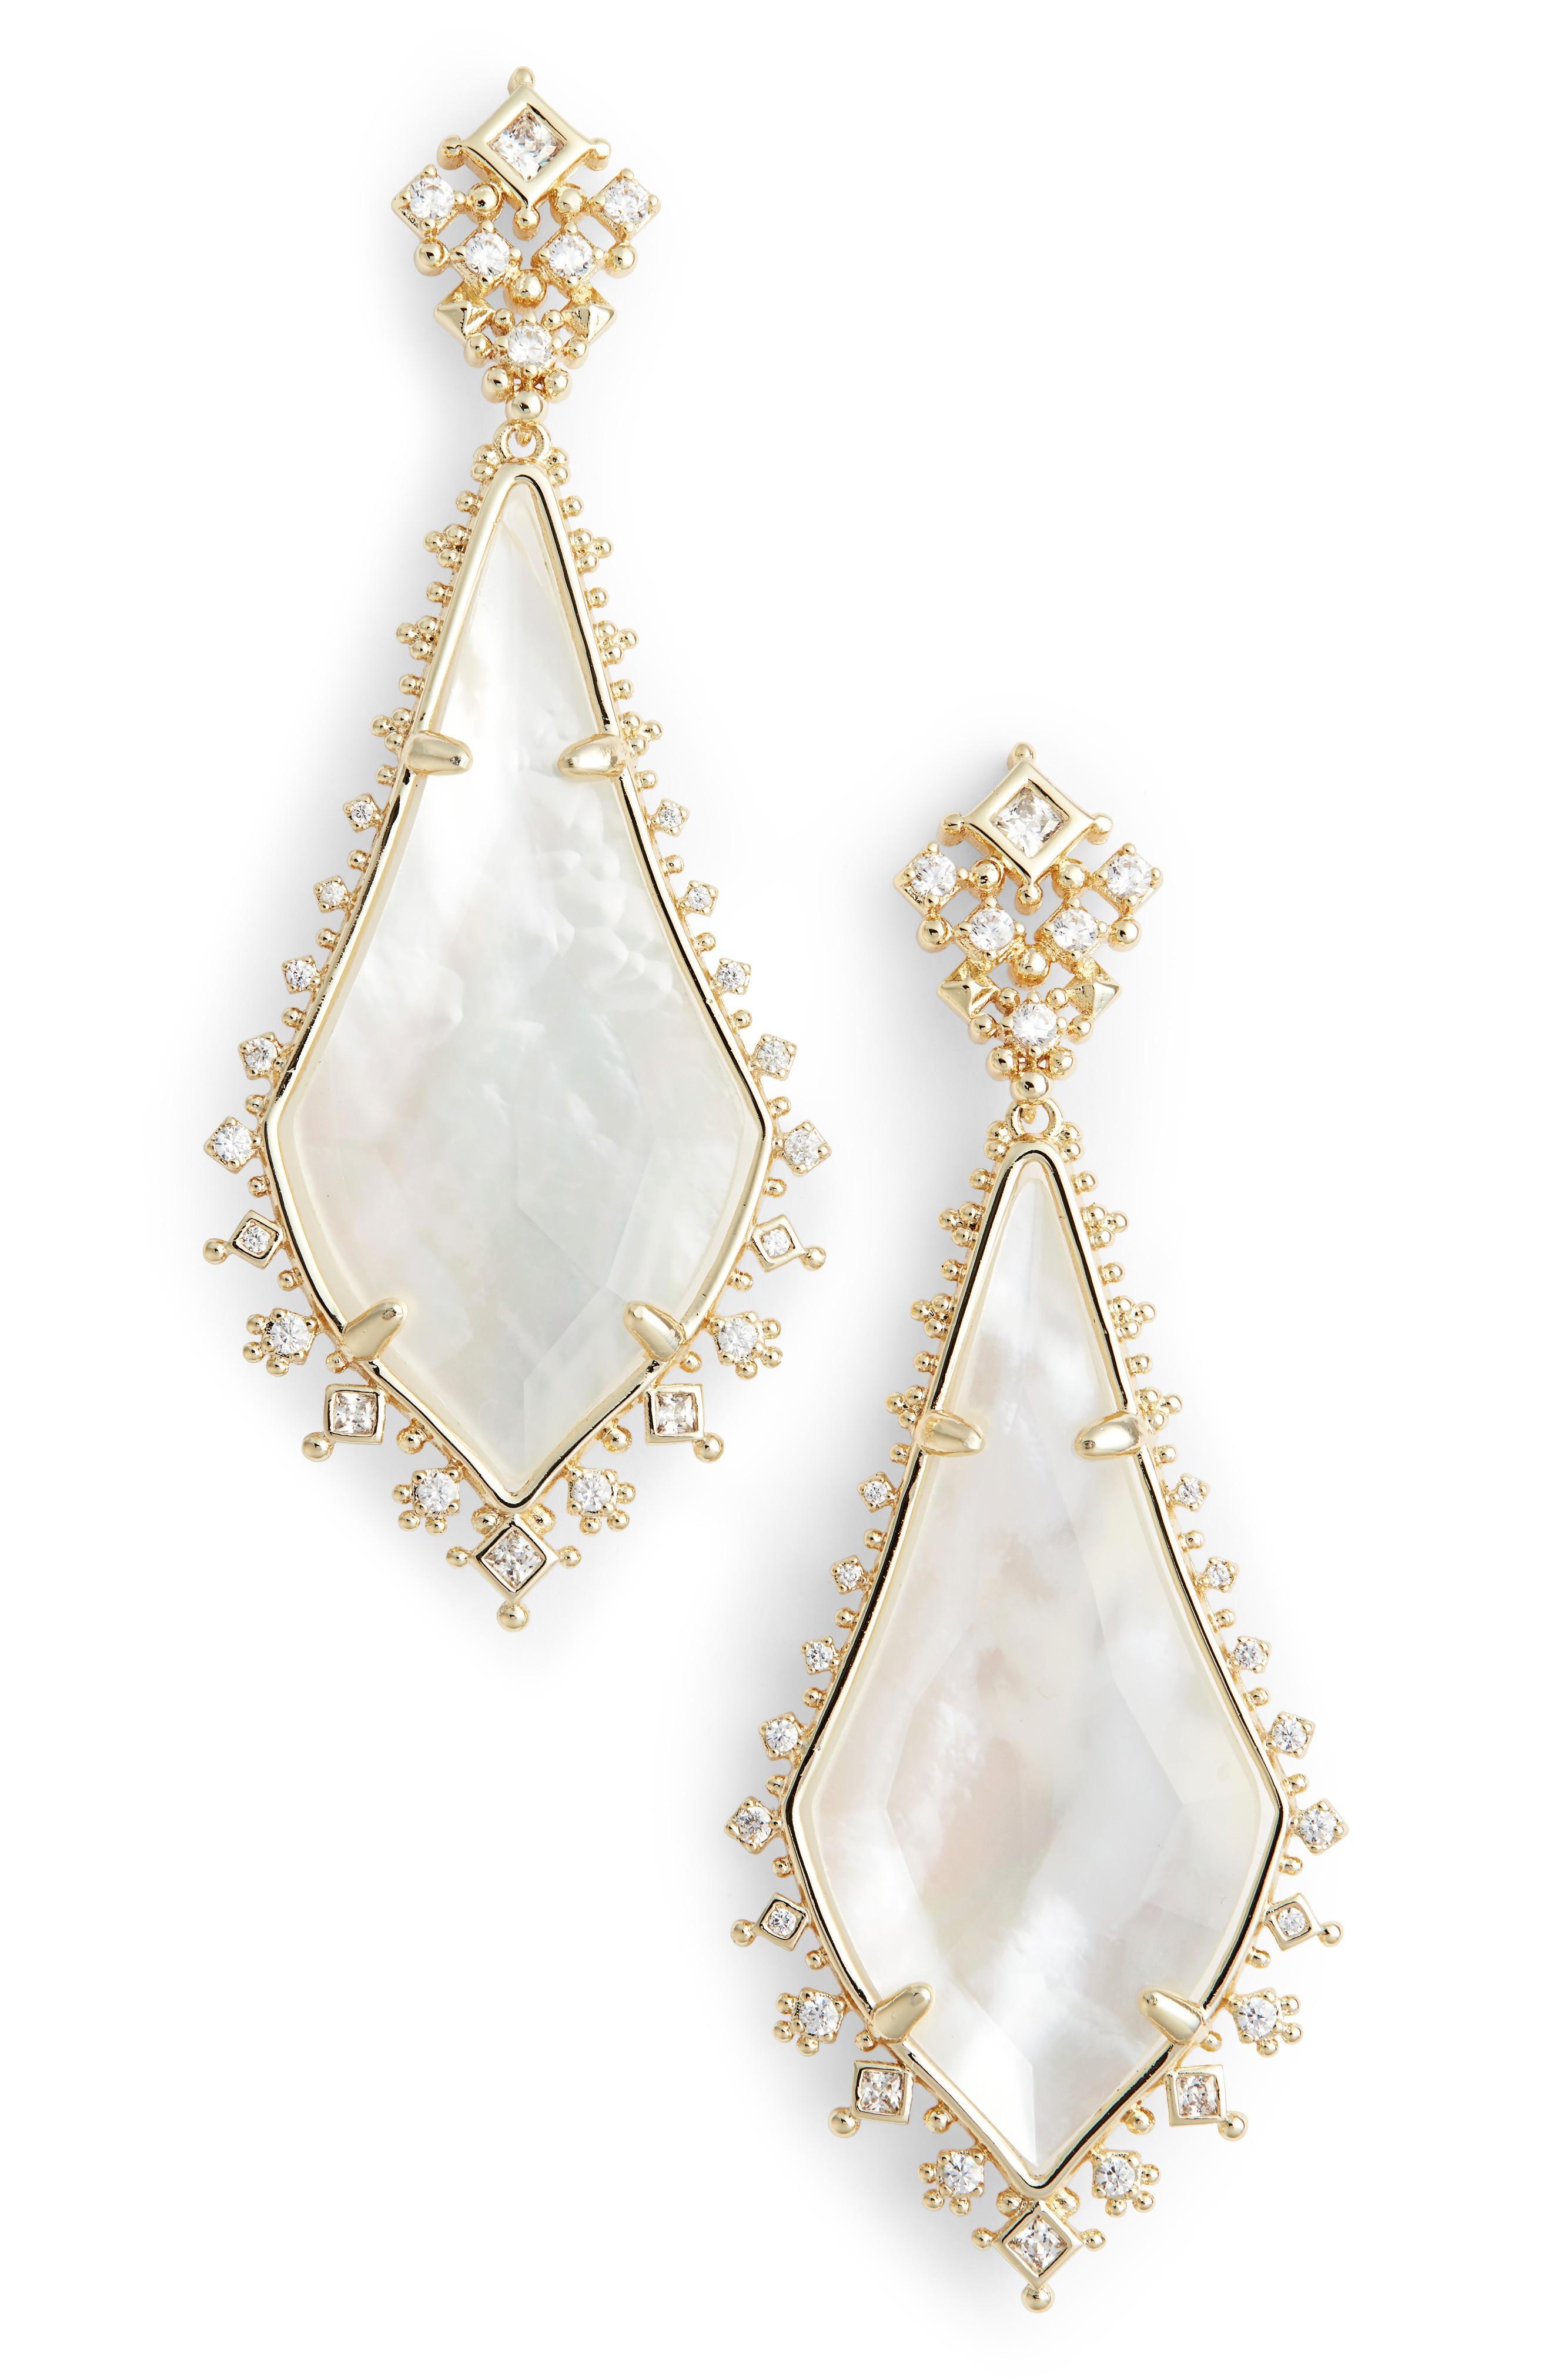 8156622286c59 Kendra Scott Martha Mother Of Pearl Drop Earrings In Rose Gold ...